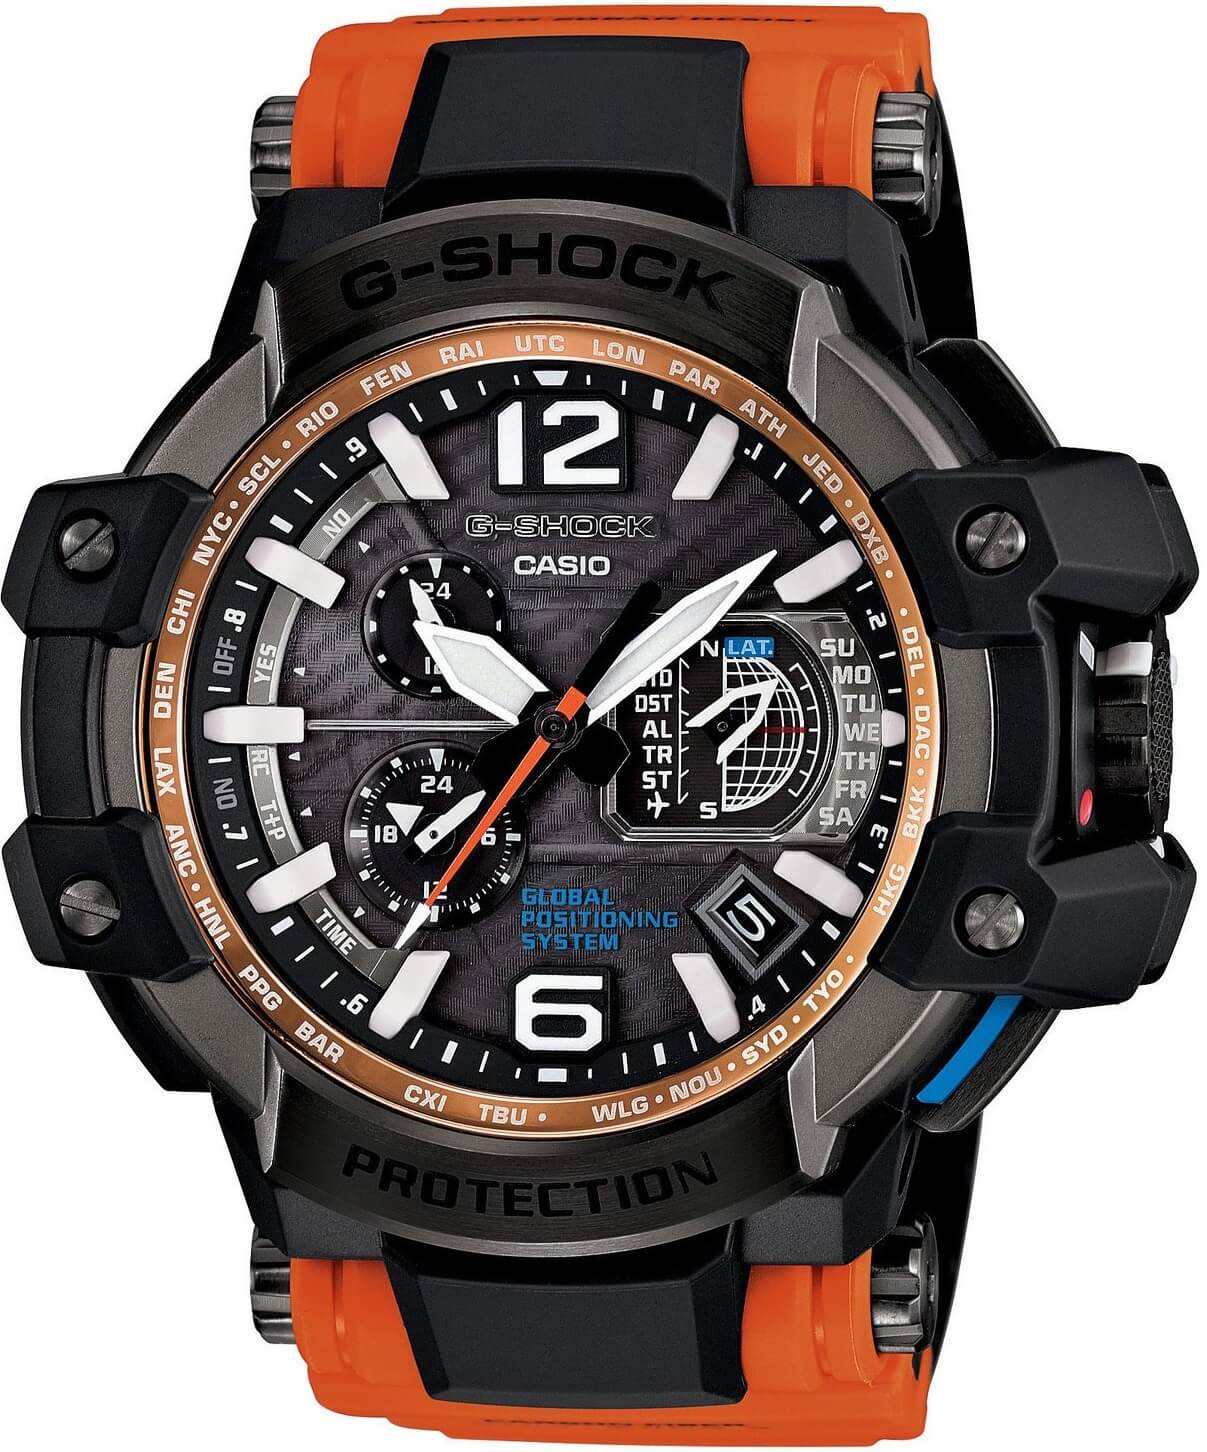 Мужские часы Casio G-Shock GPW-1000-4AER